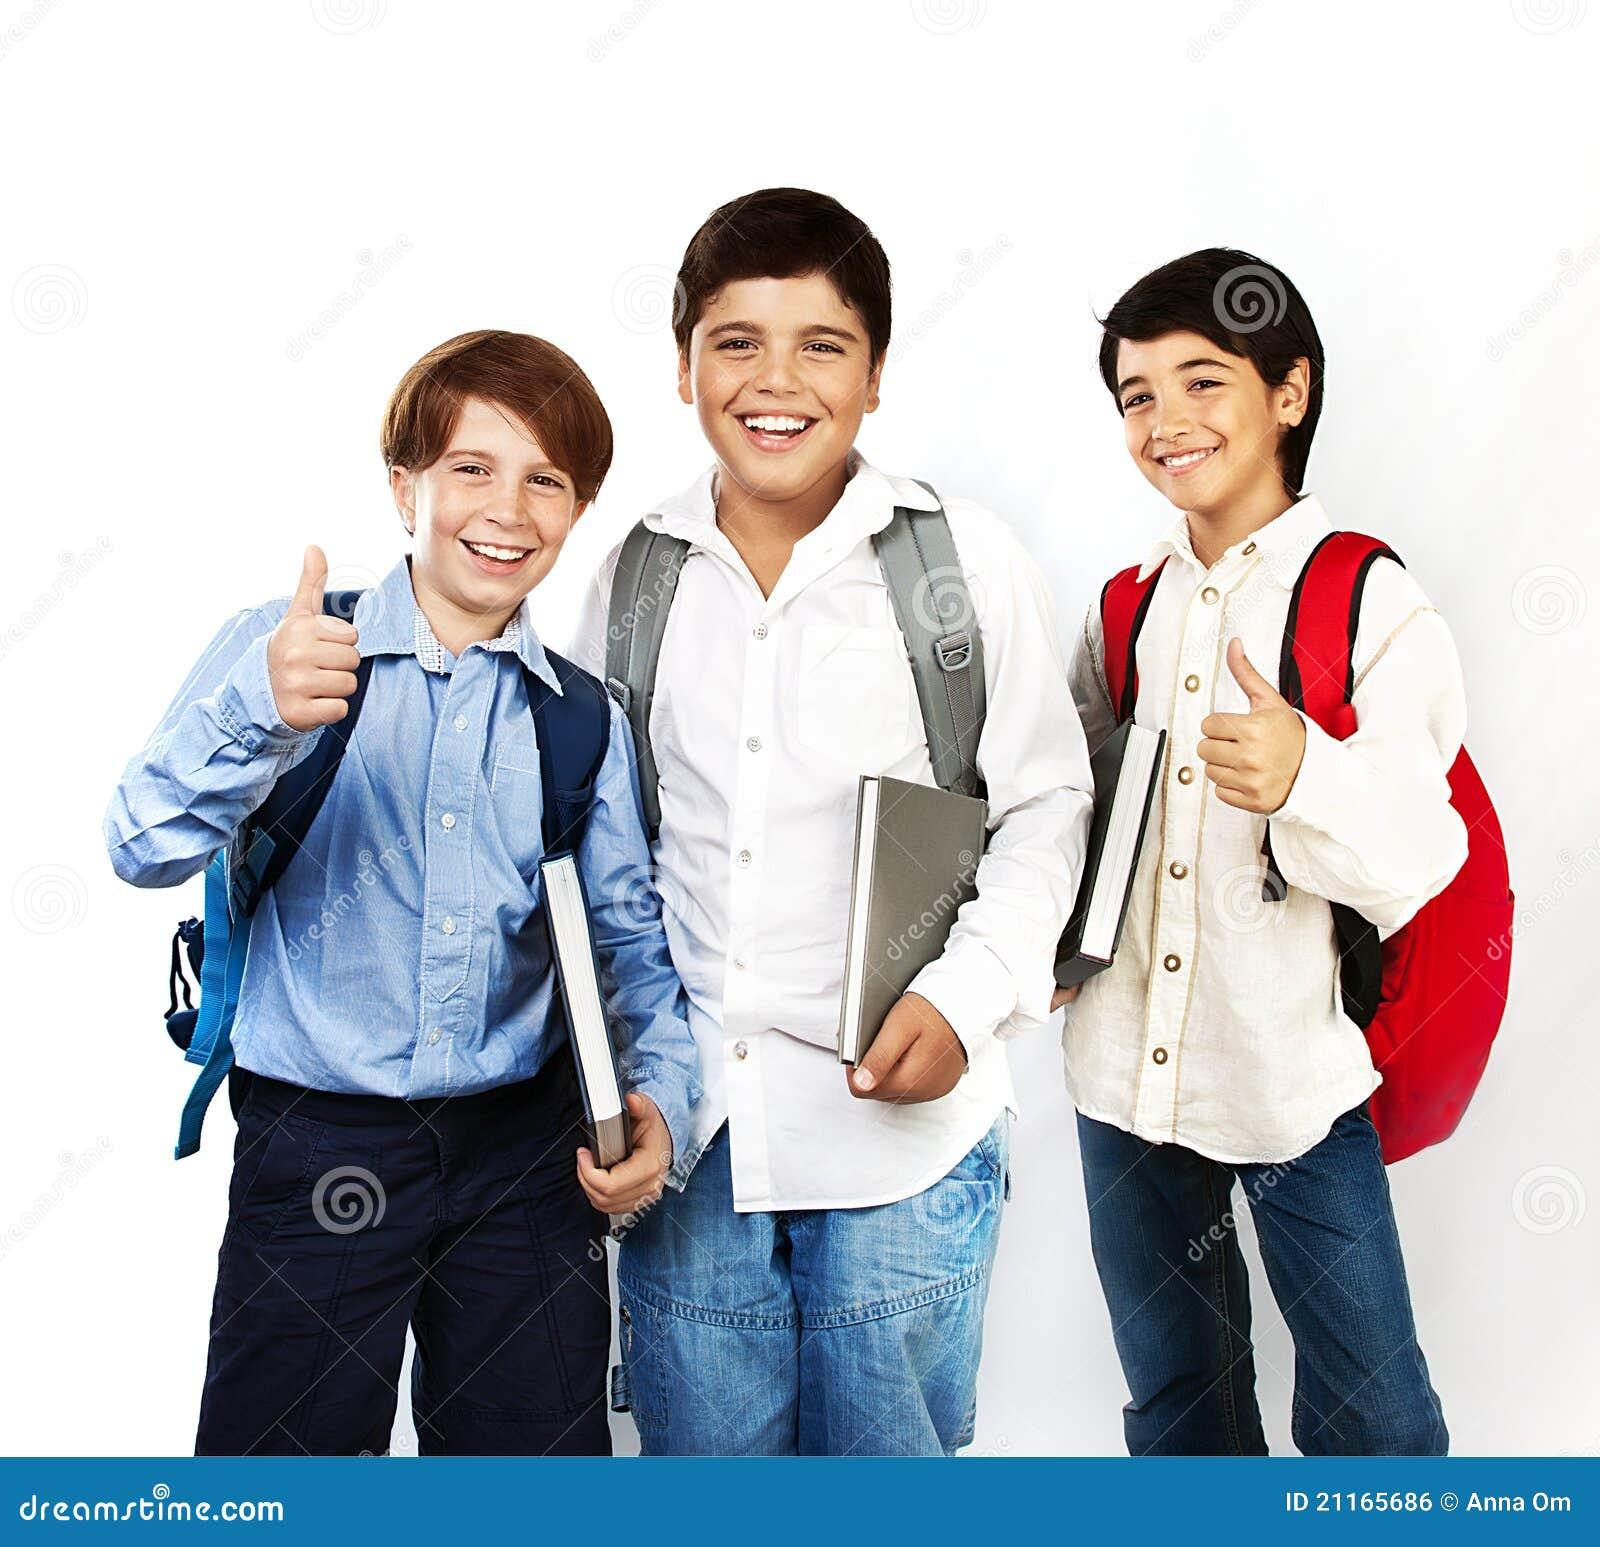 картинки школьники: